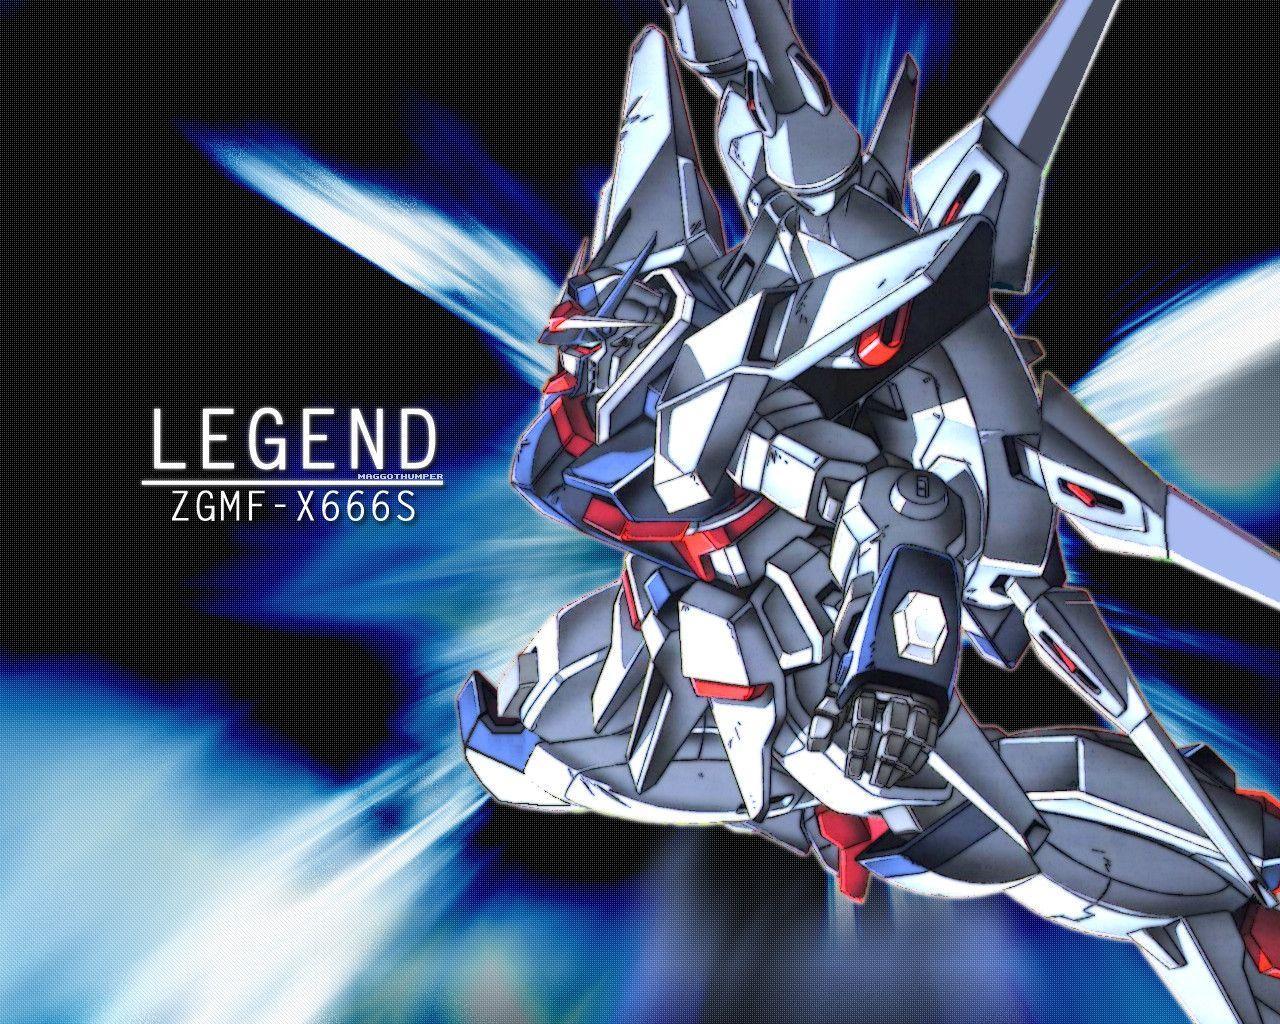 <b>Gundam Seed</b> Zaft Pilots images <b>Wallpaper</b> HD <b>wallpaper</b> and ...